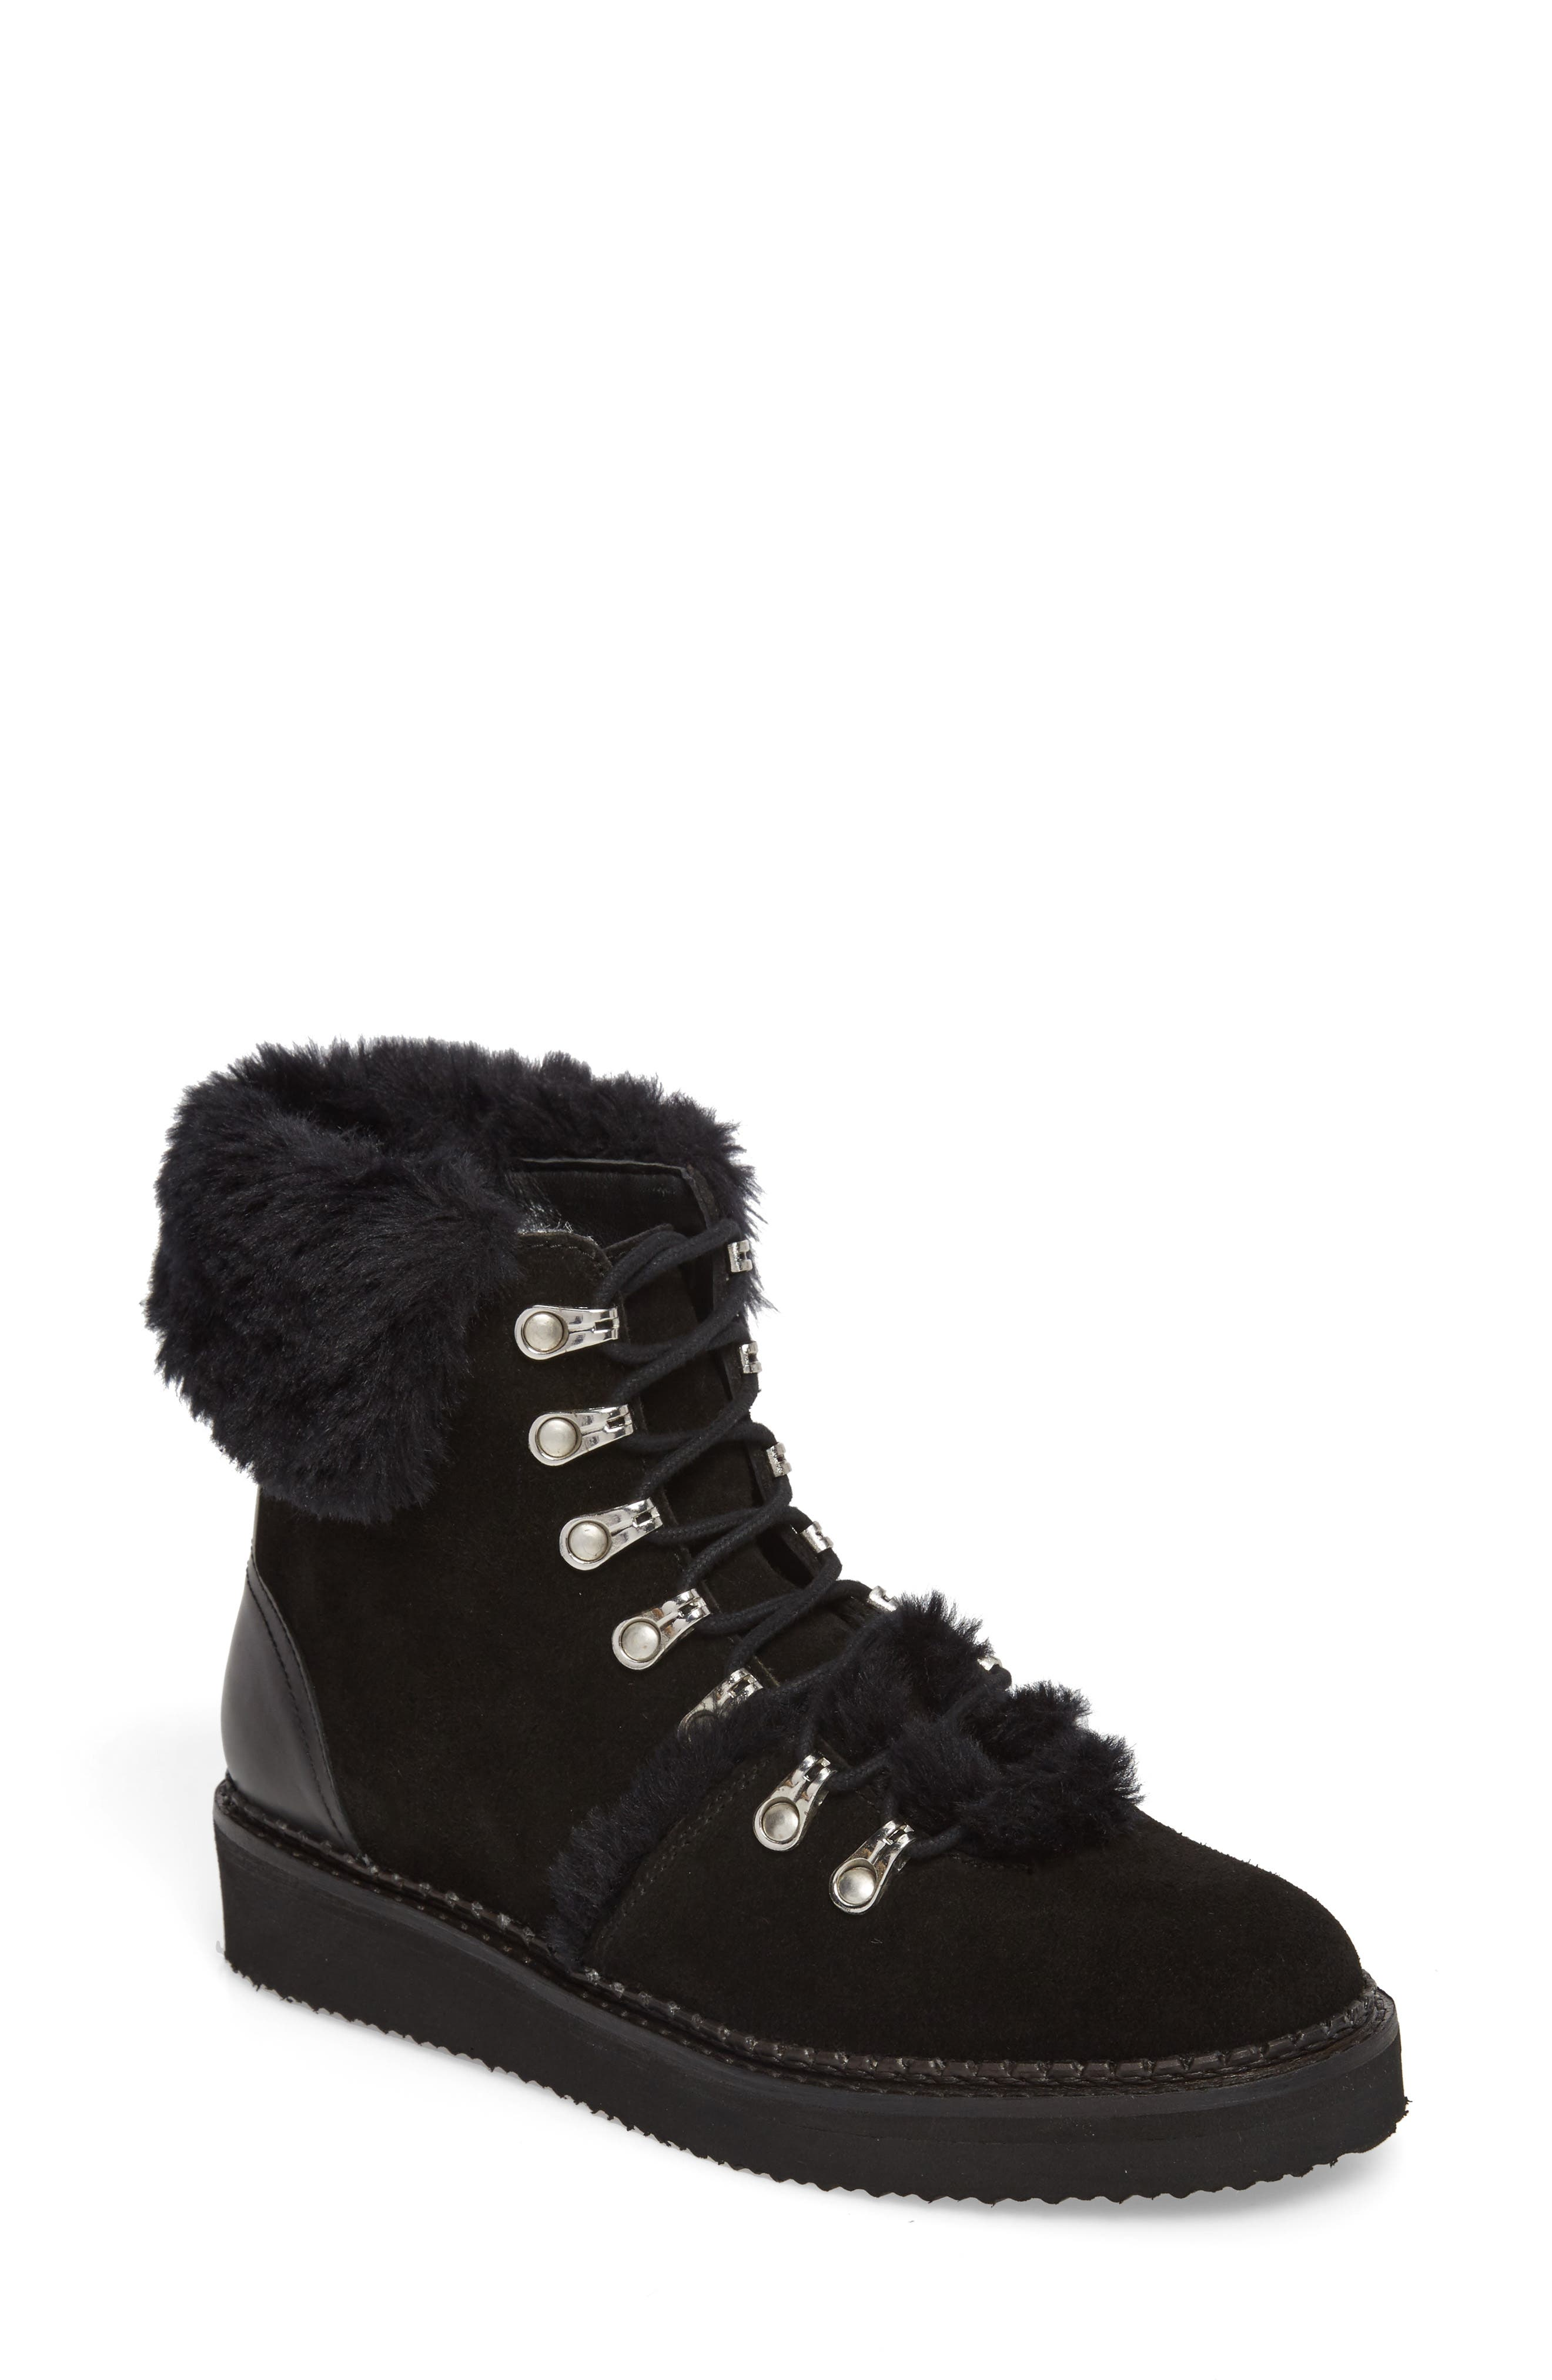 Tonkin Hiker Boot,                         Main,                         color, Black